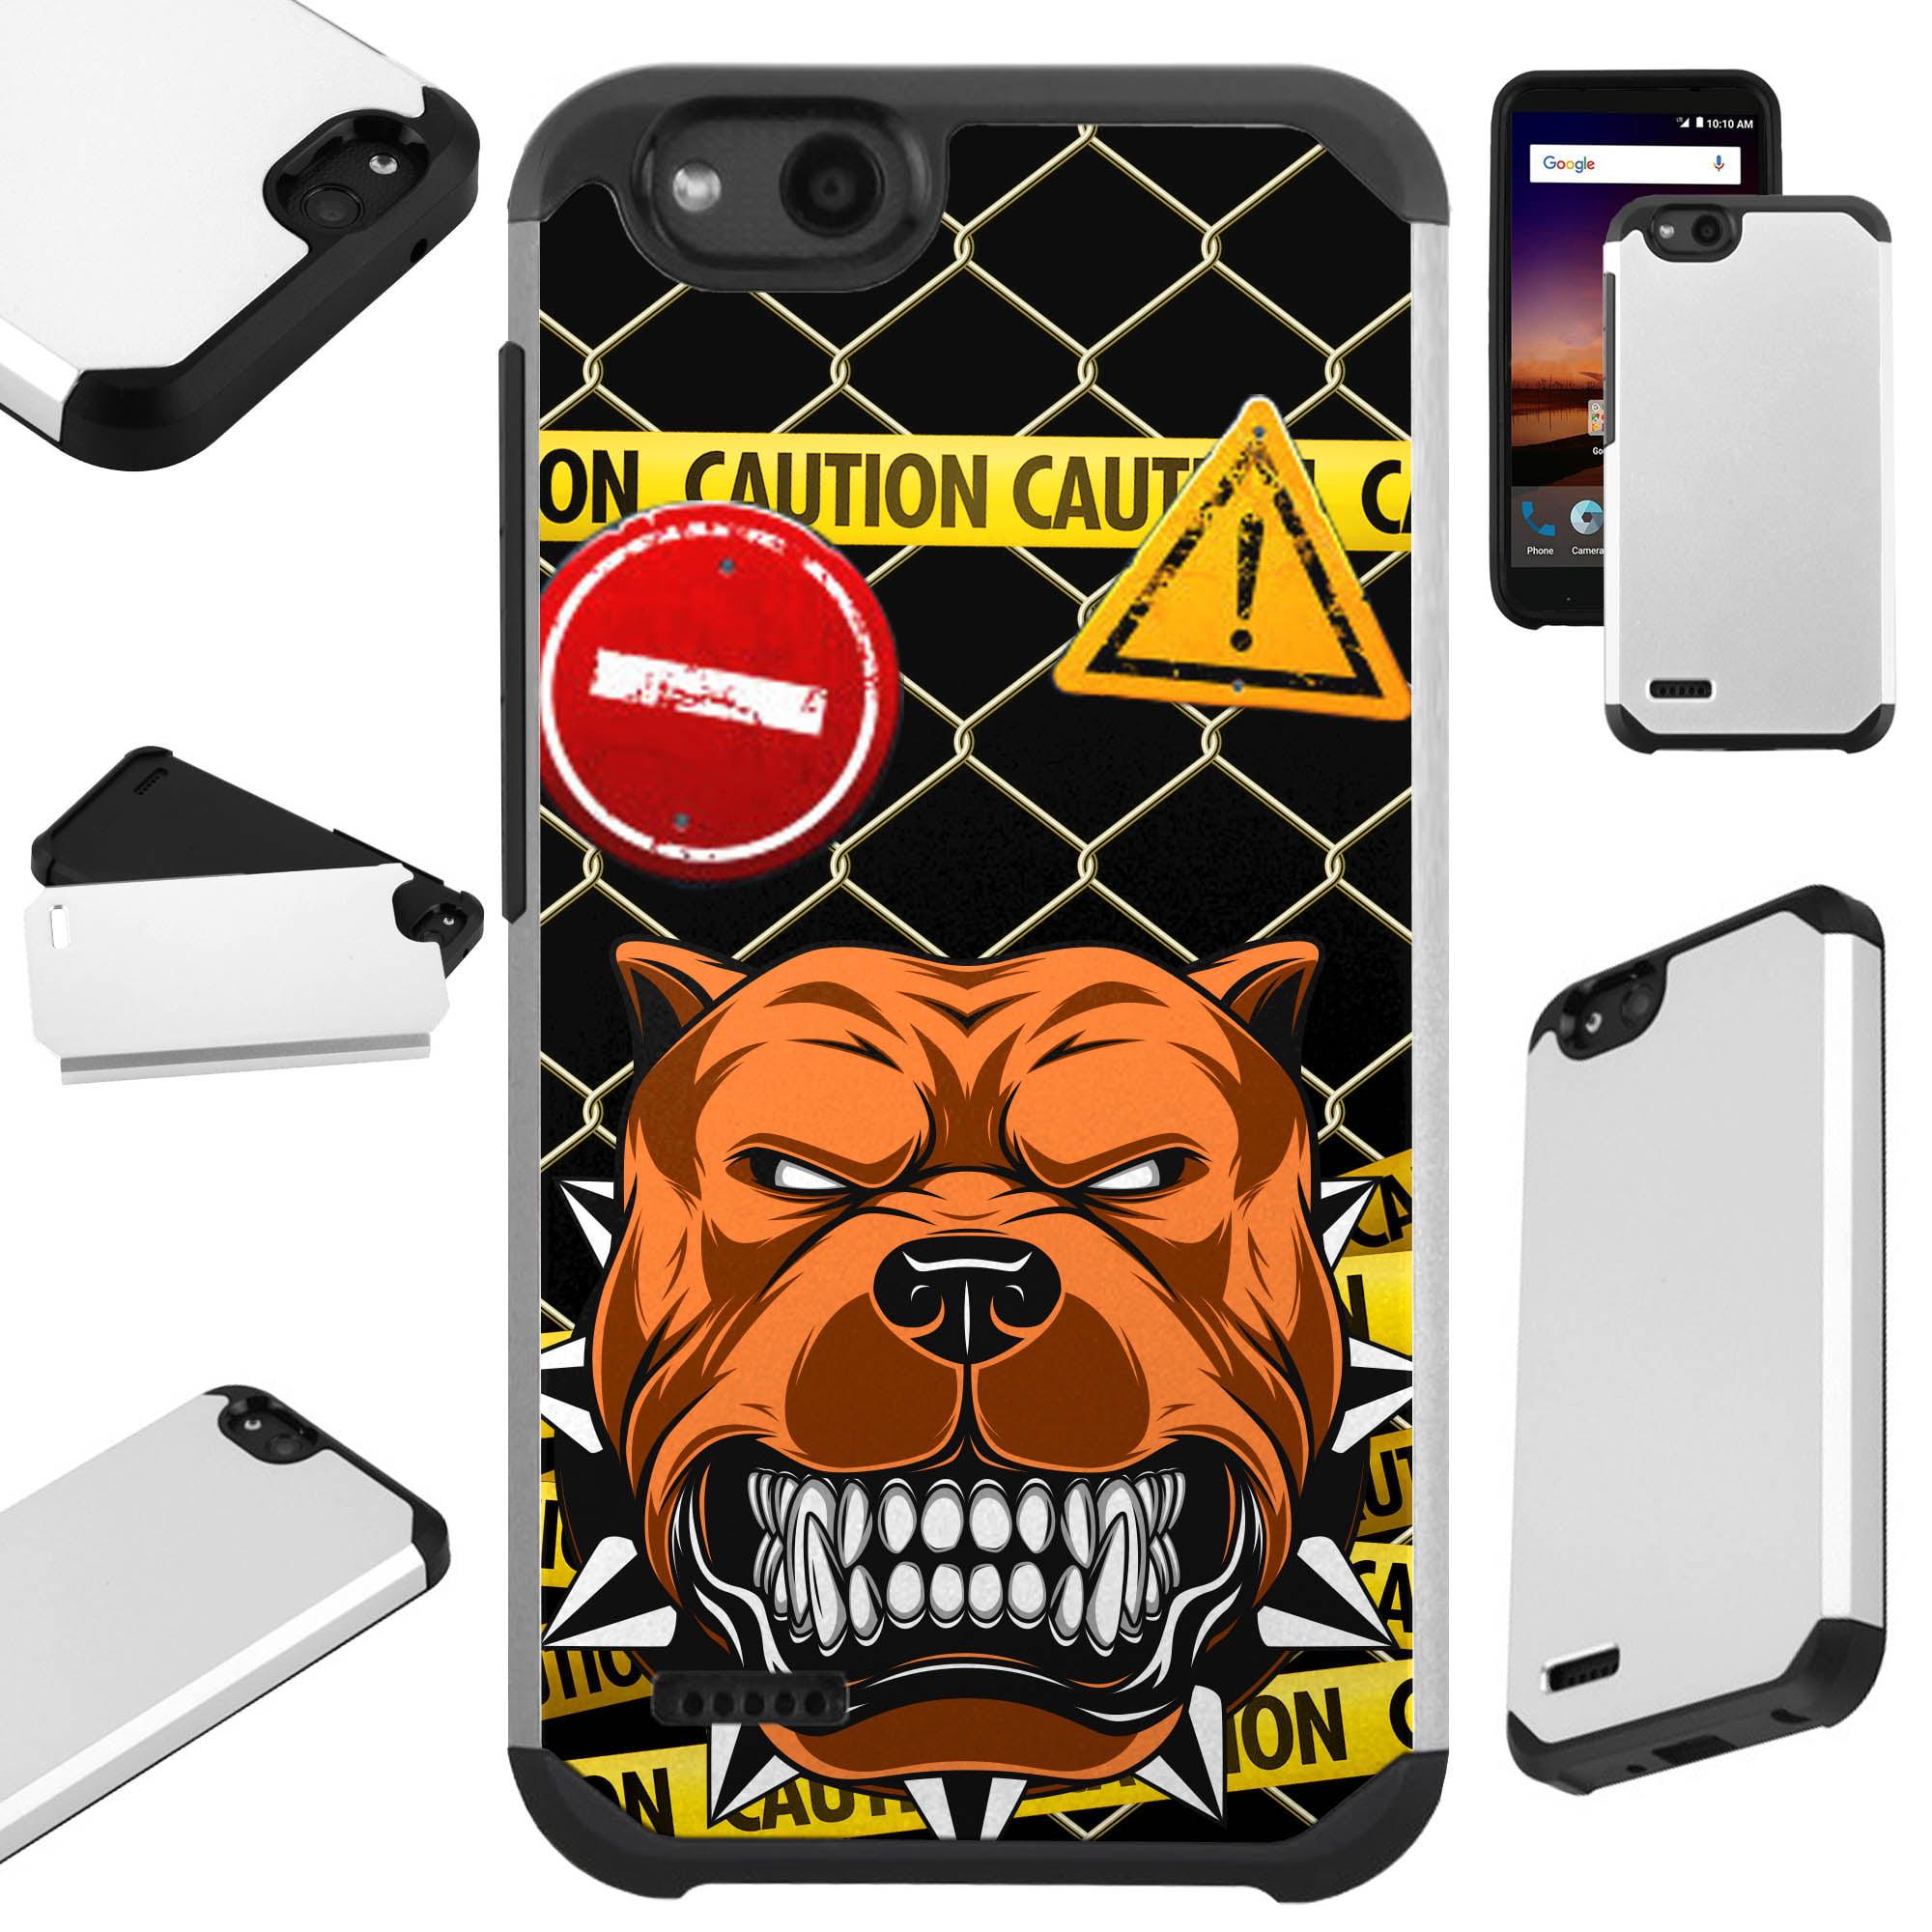 For ZTE ZFive G LTE / ZFive C / Avid 4 / Fanfare 3 / Blade Vantage / Tempo X / Tempo Go Case Hybrid TPU Fusion Phone Cover (Mad Dog Caution)